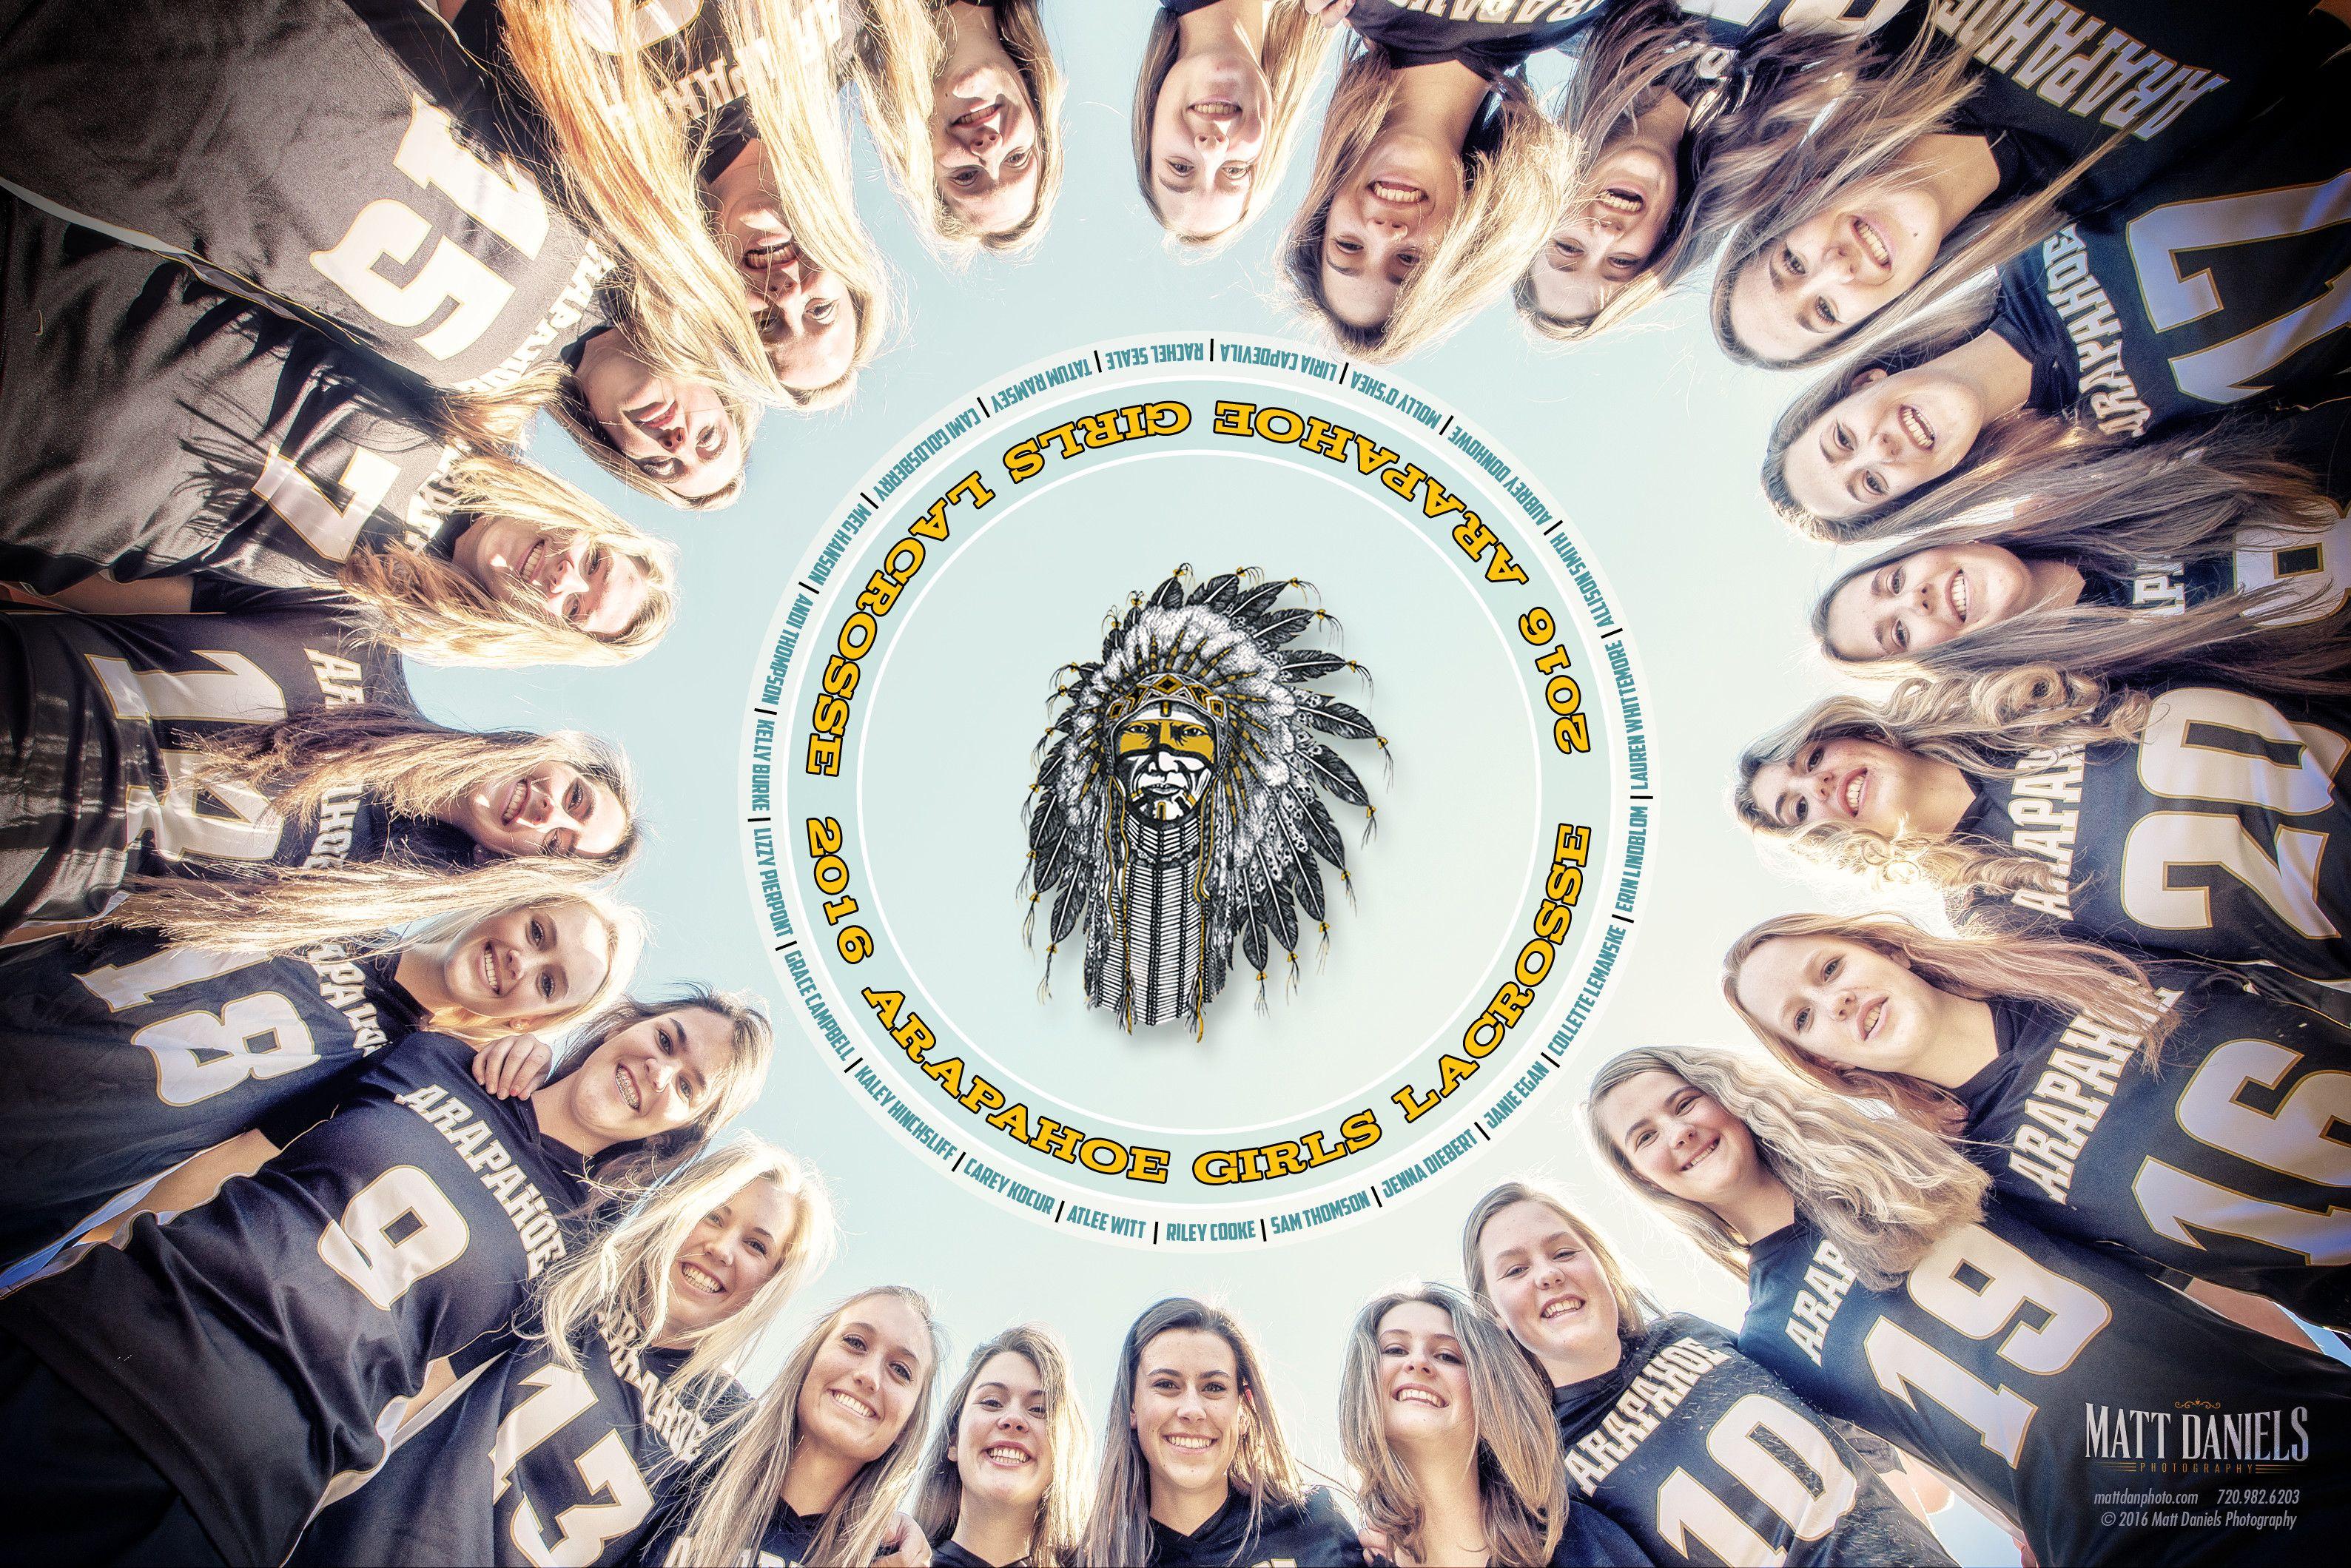 2016 Arapahoe Girls Lacrosse Team Simple Poster Design Created Around This Huddle Photo Copyright 2016 Matt Lacrosse Team Photos Lacrosse Team Lacrosse Girls